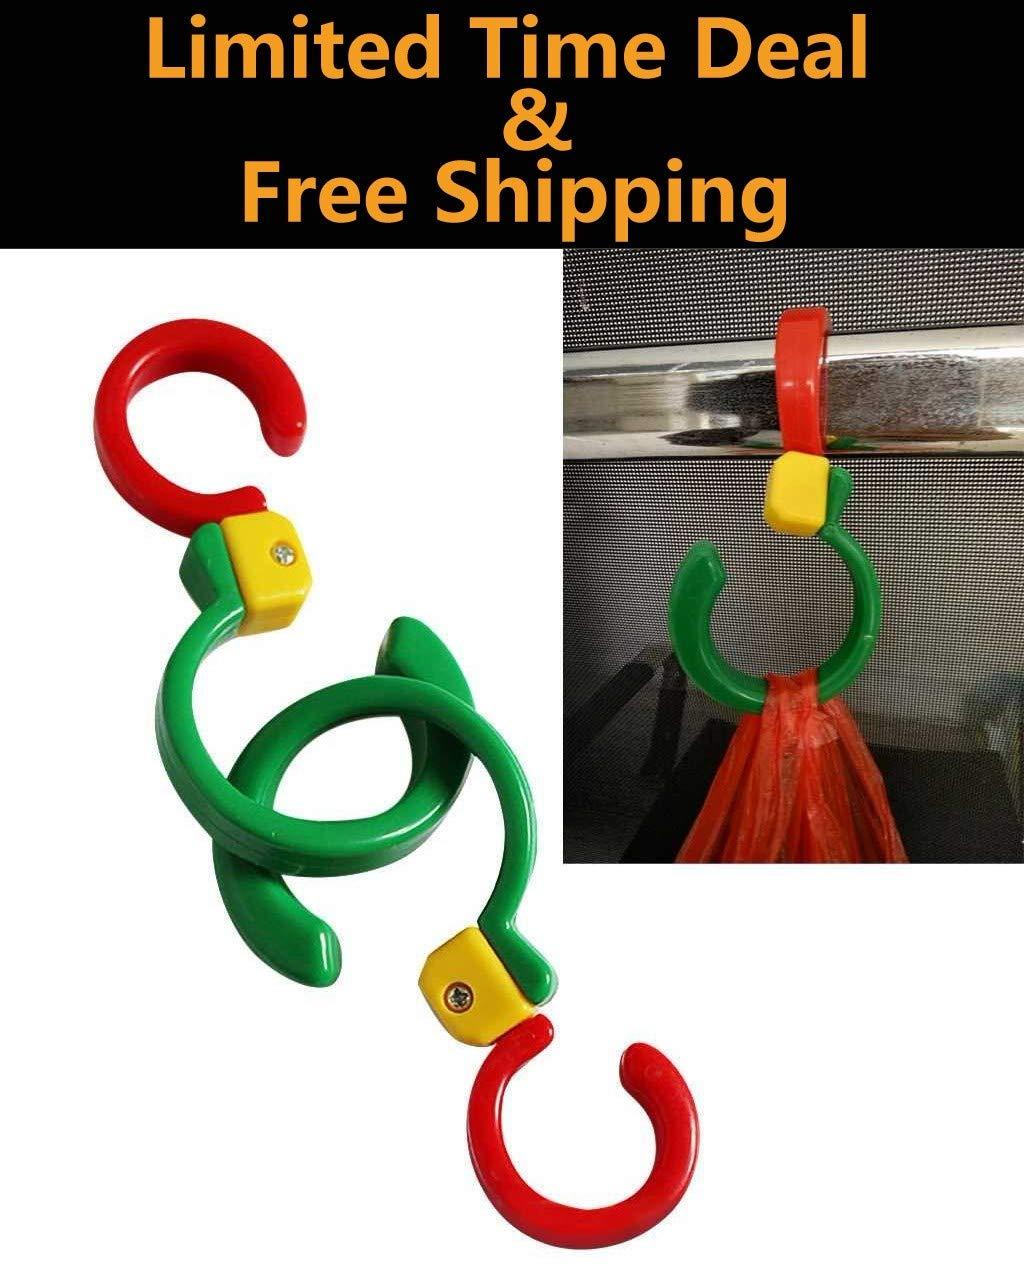 Riforla ⭐⭐⭐⭐⭐ Hook New 2Pc 360° Rotation Hook Clothes Hanger Hook Multi-Fonction Hook Home Supplie Kitchen Door Back Hook Plastic Coat Hook Strong Jewelry Stand Kitchenware Storage Rack Keychain Hook